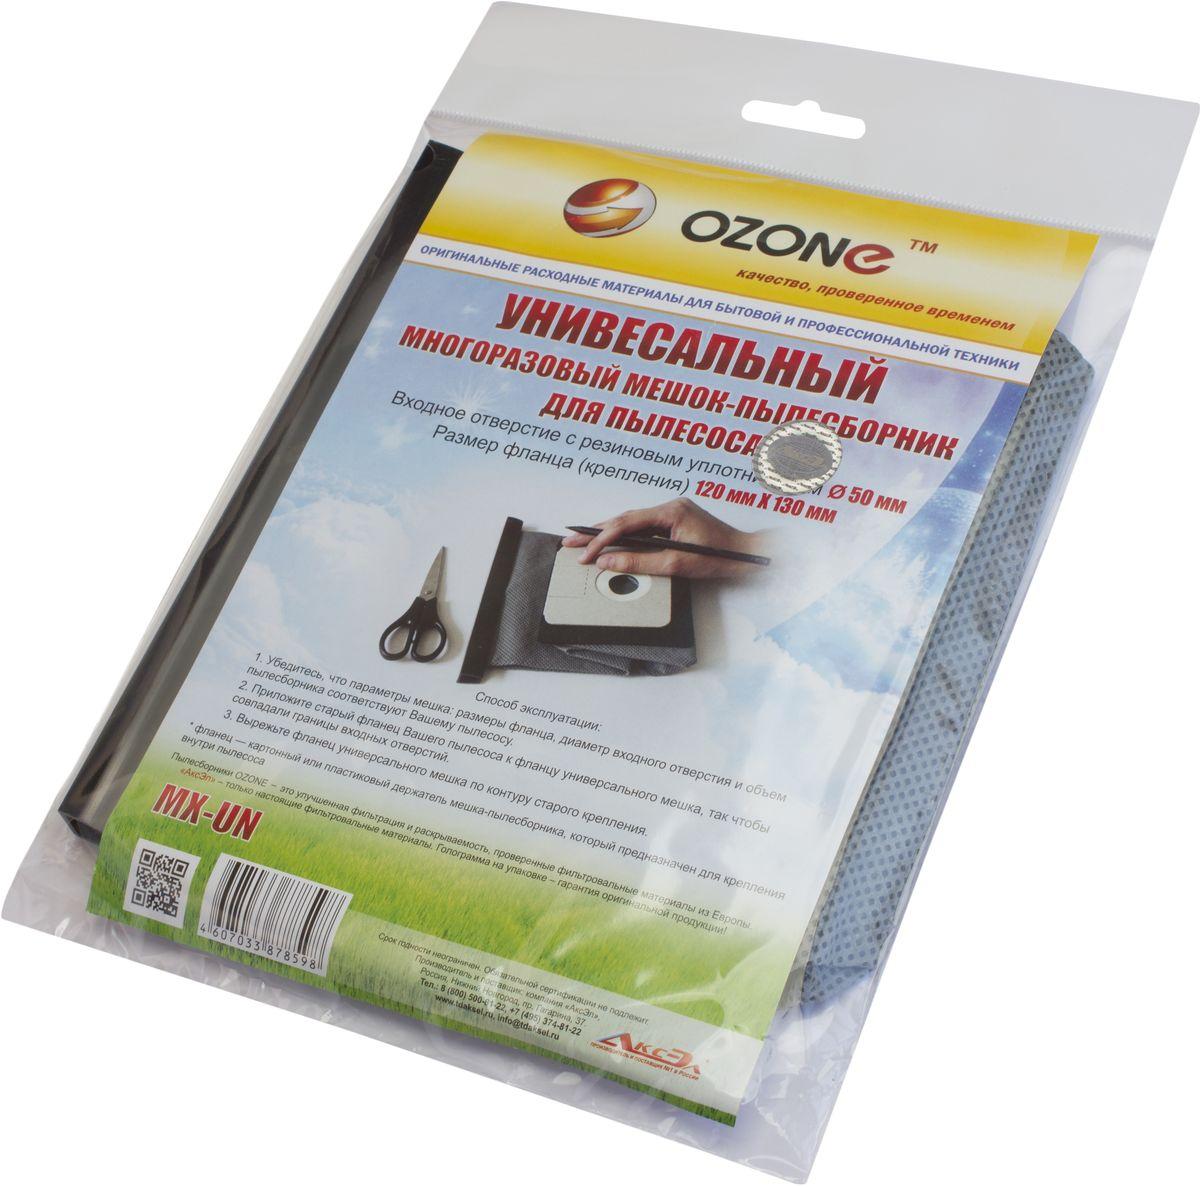 Ozone MX-UN пылесборник универсальный ozone microne h 19